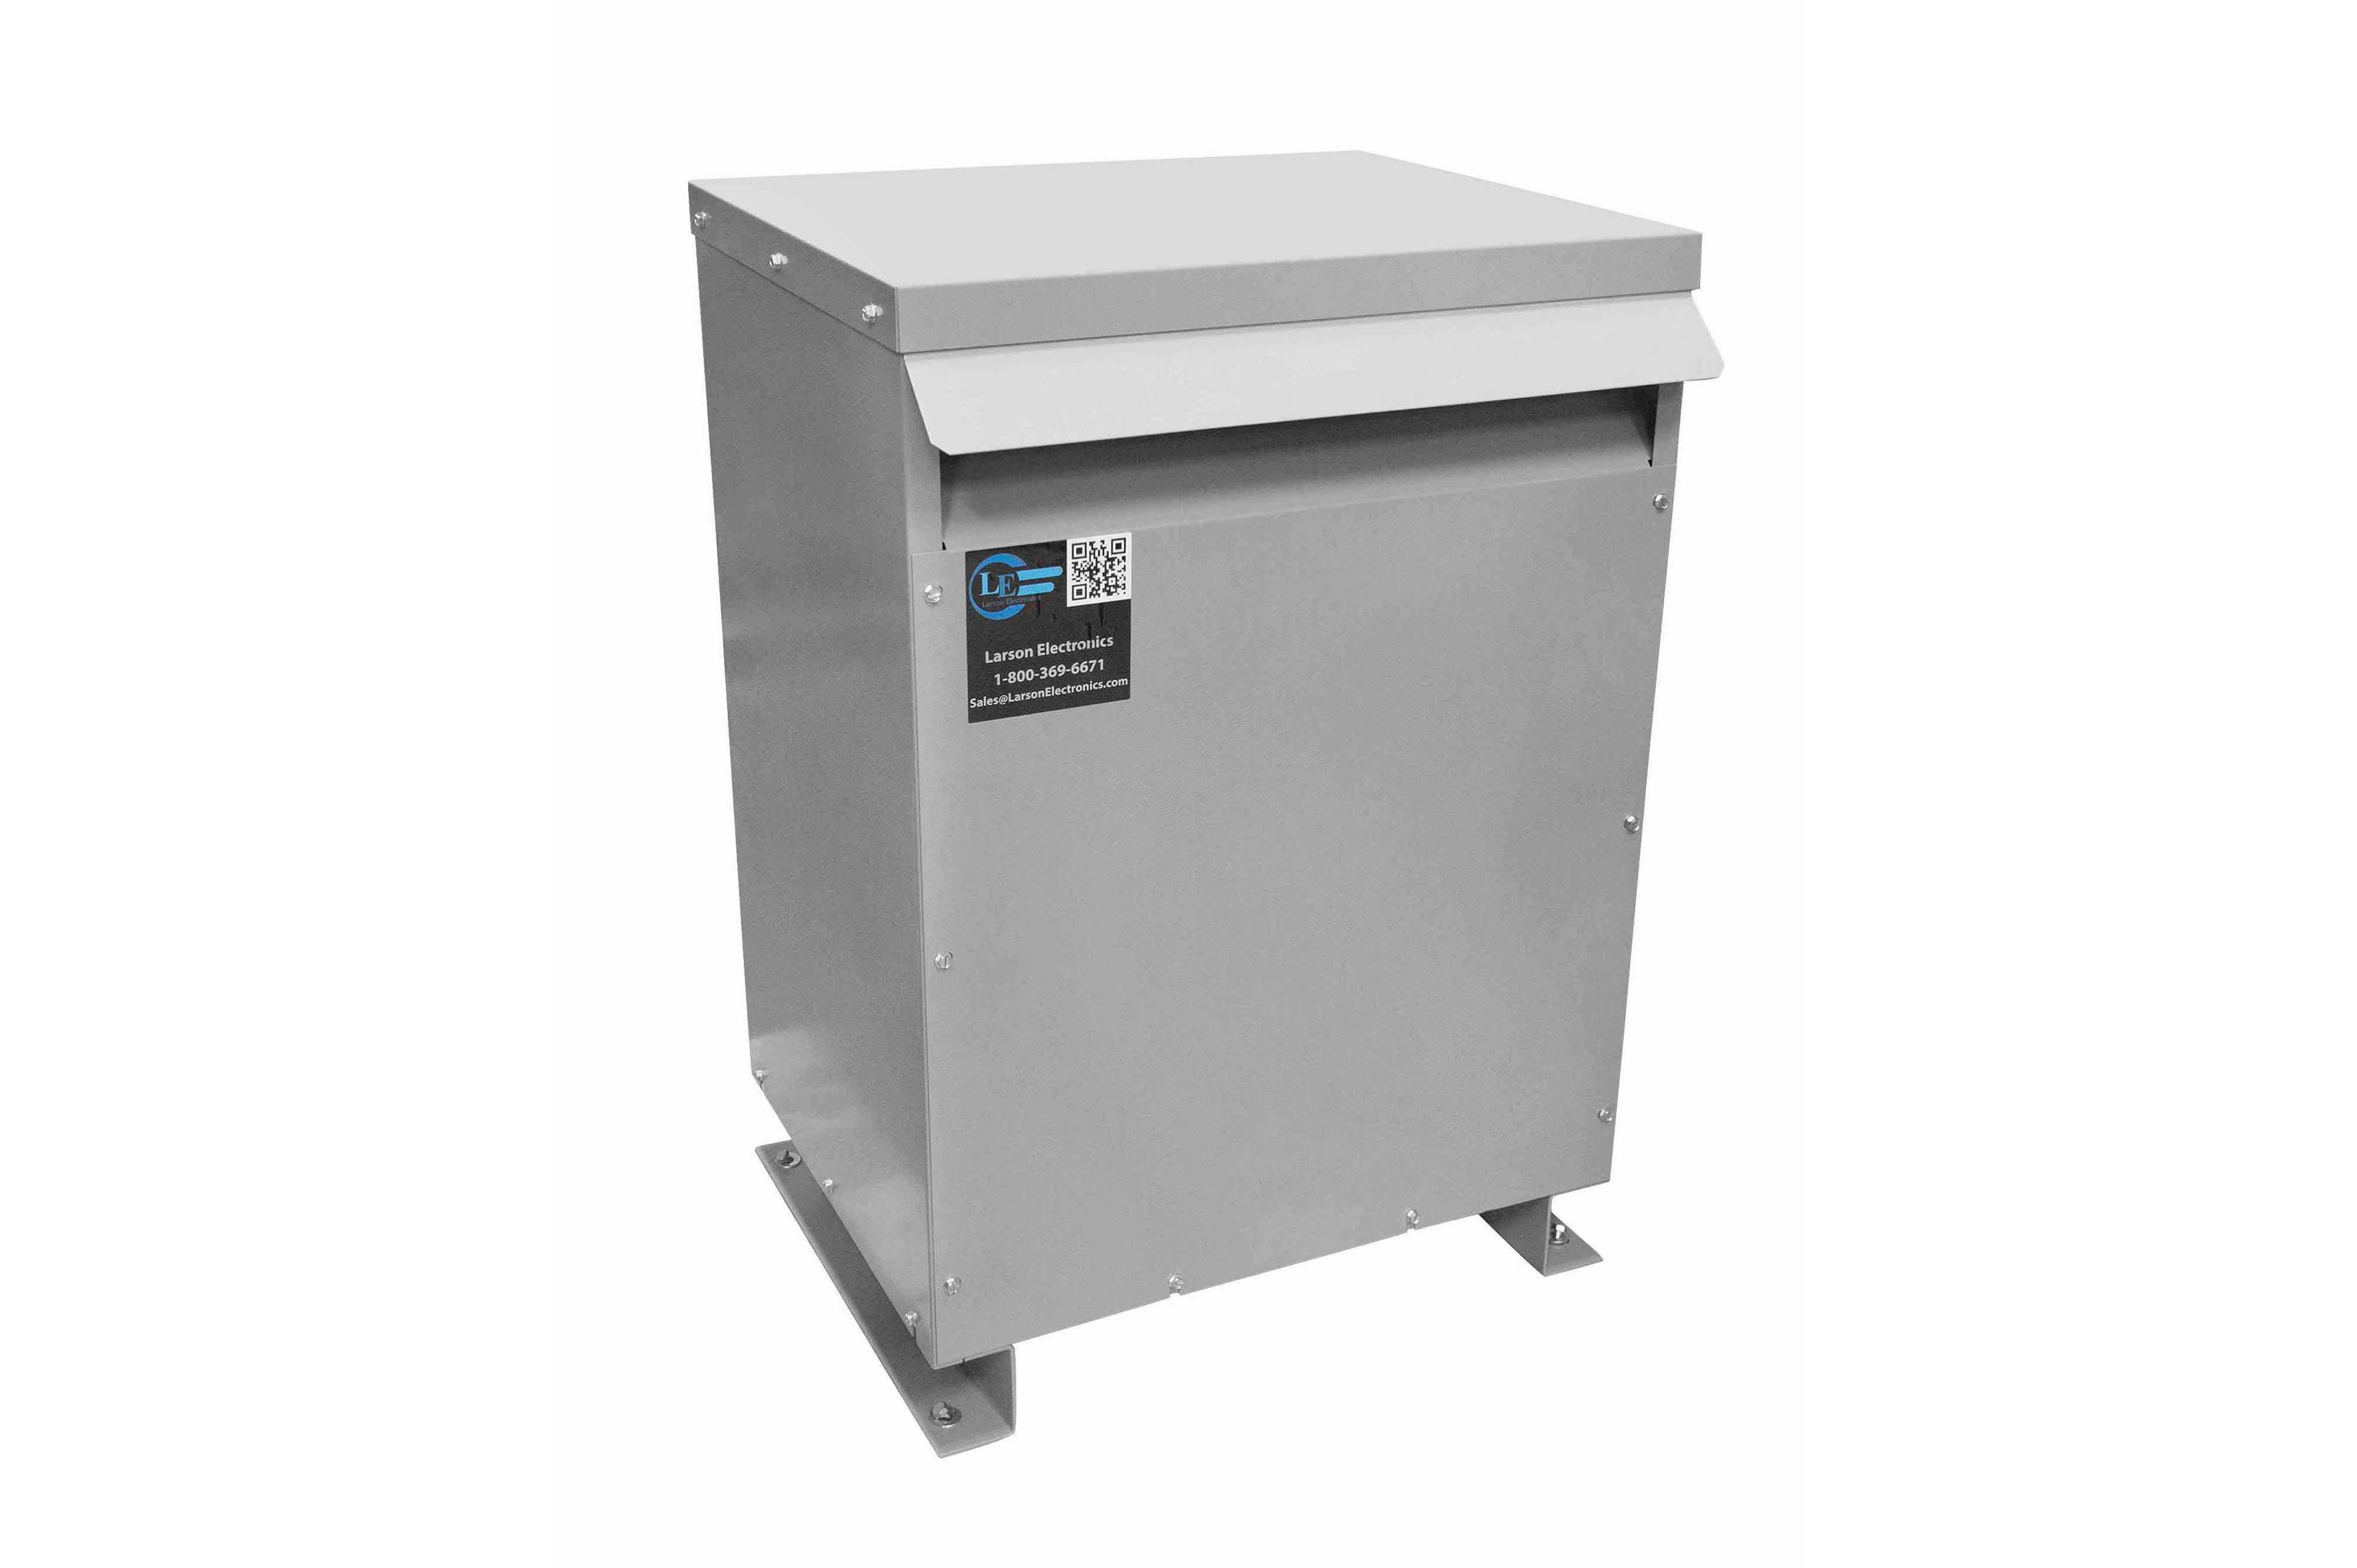 52.5 kVA 3PH Isolation Transformer, 400V Wye Primary, 208Y/120 Wye-N Secondary, N3R, Ventilated, 60 Hz